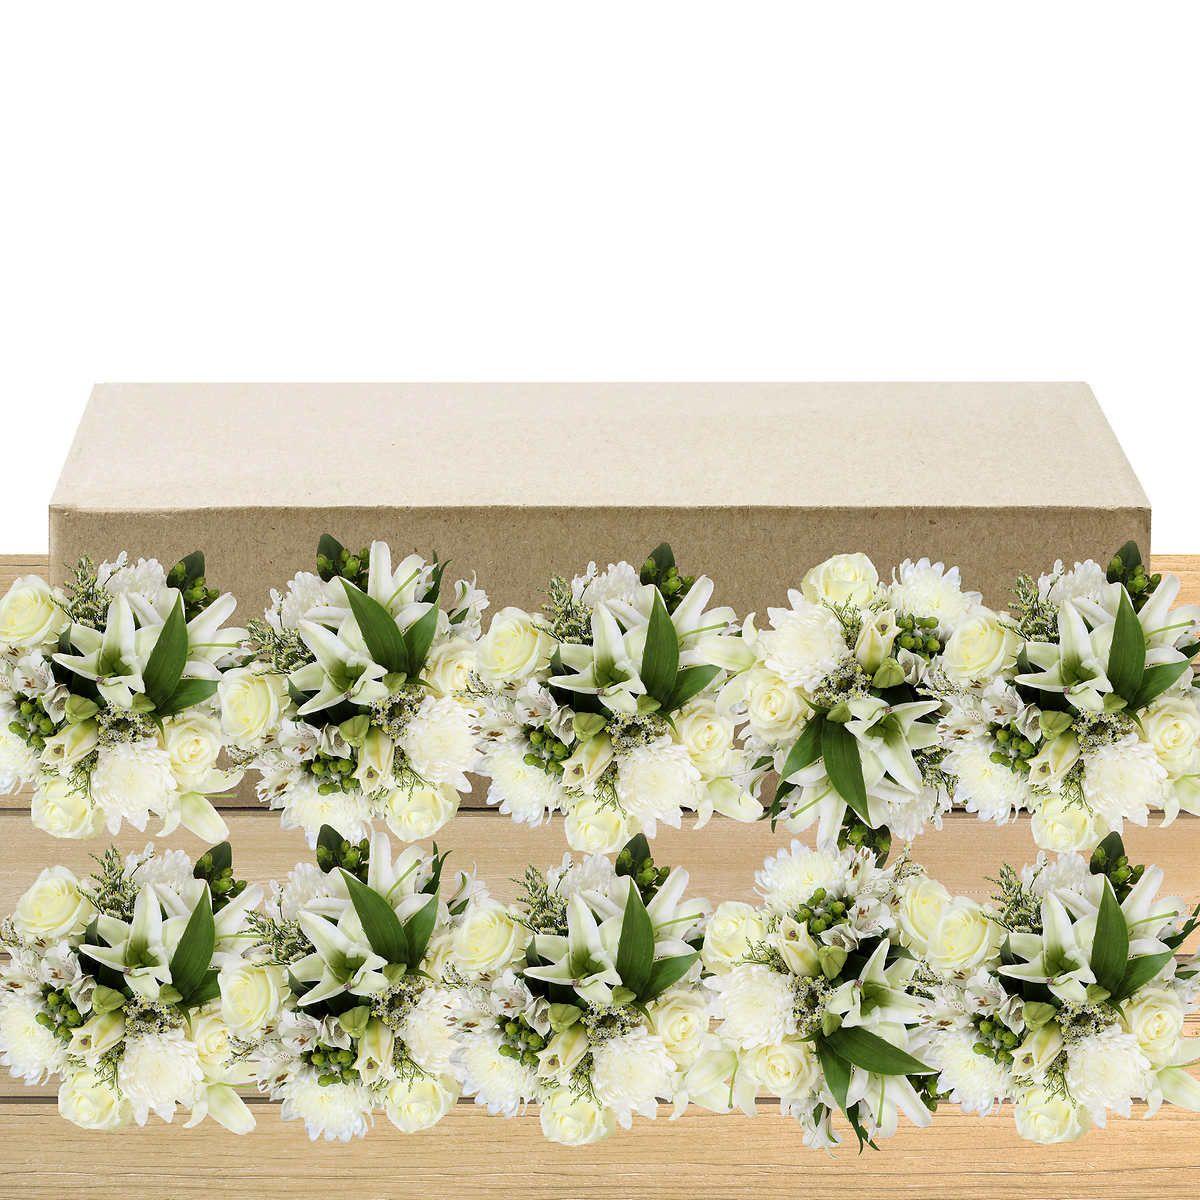 White 2 Outdoor Wedding Flowers Arrangements Costco Wedding Flowers Simple Wedding Centerpieces